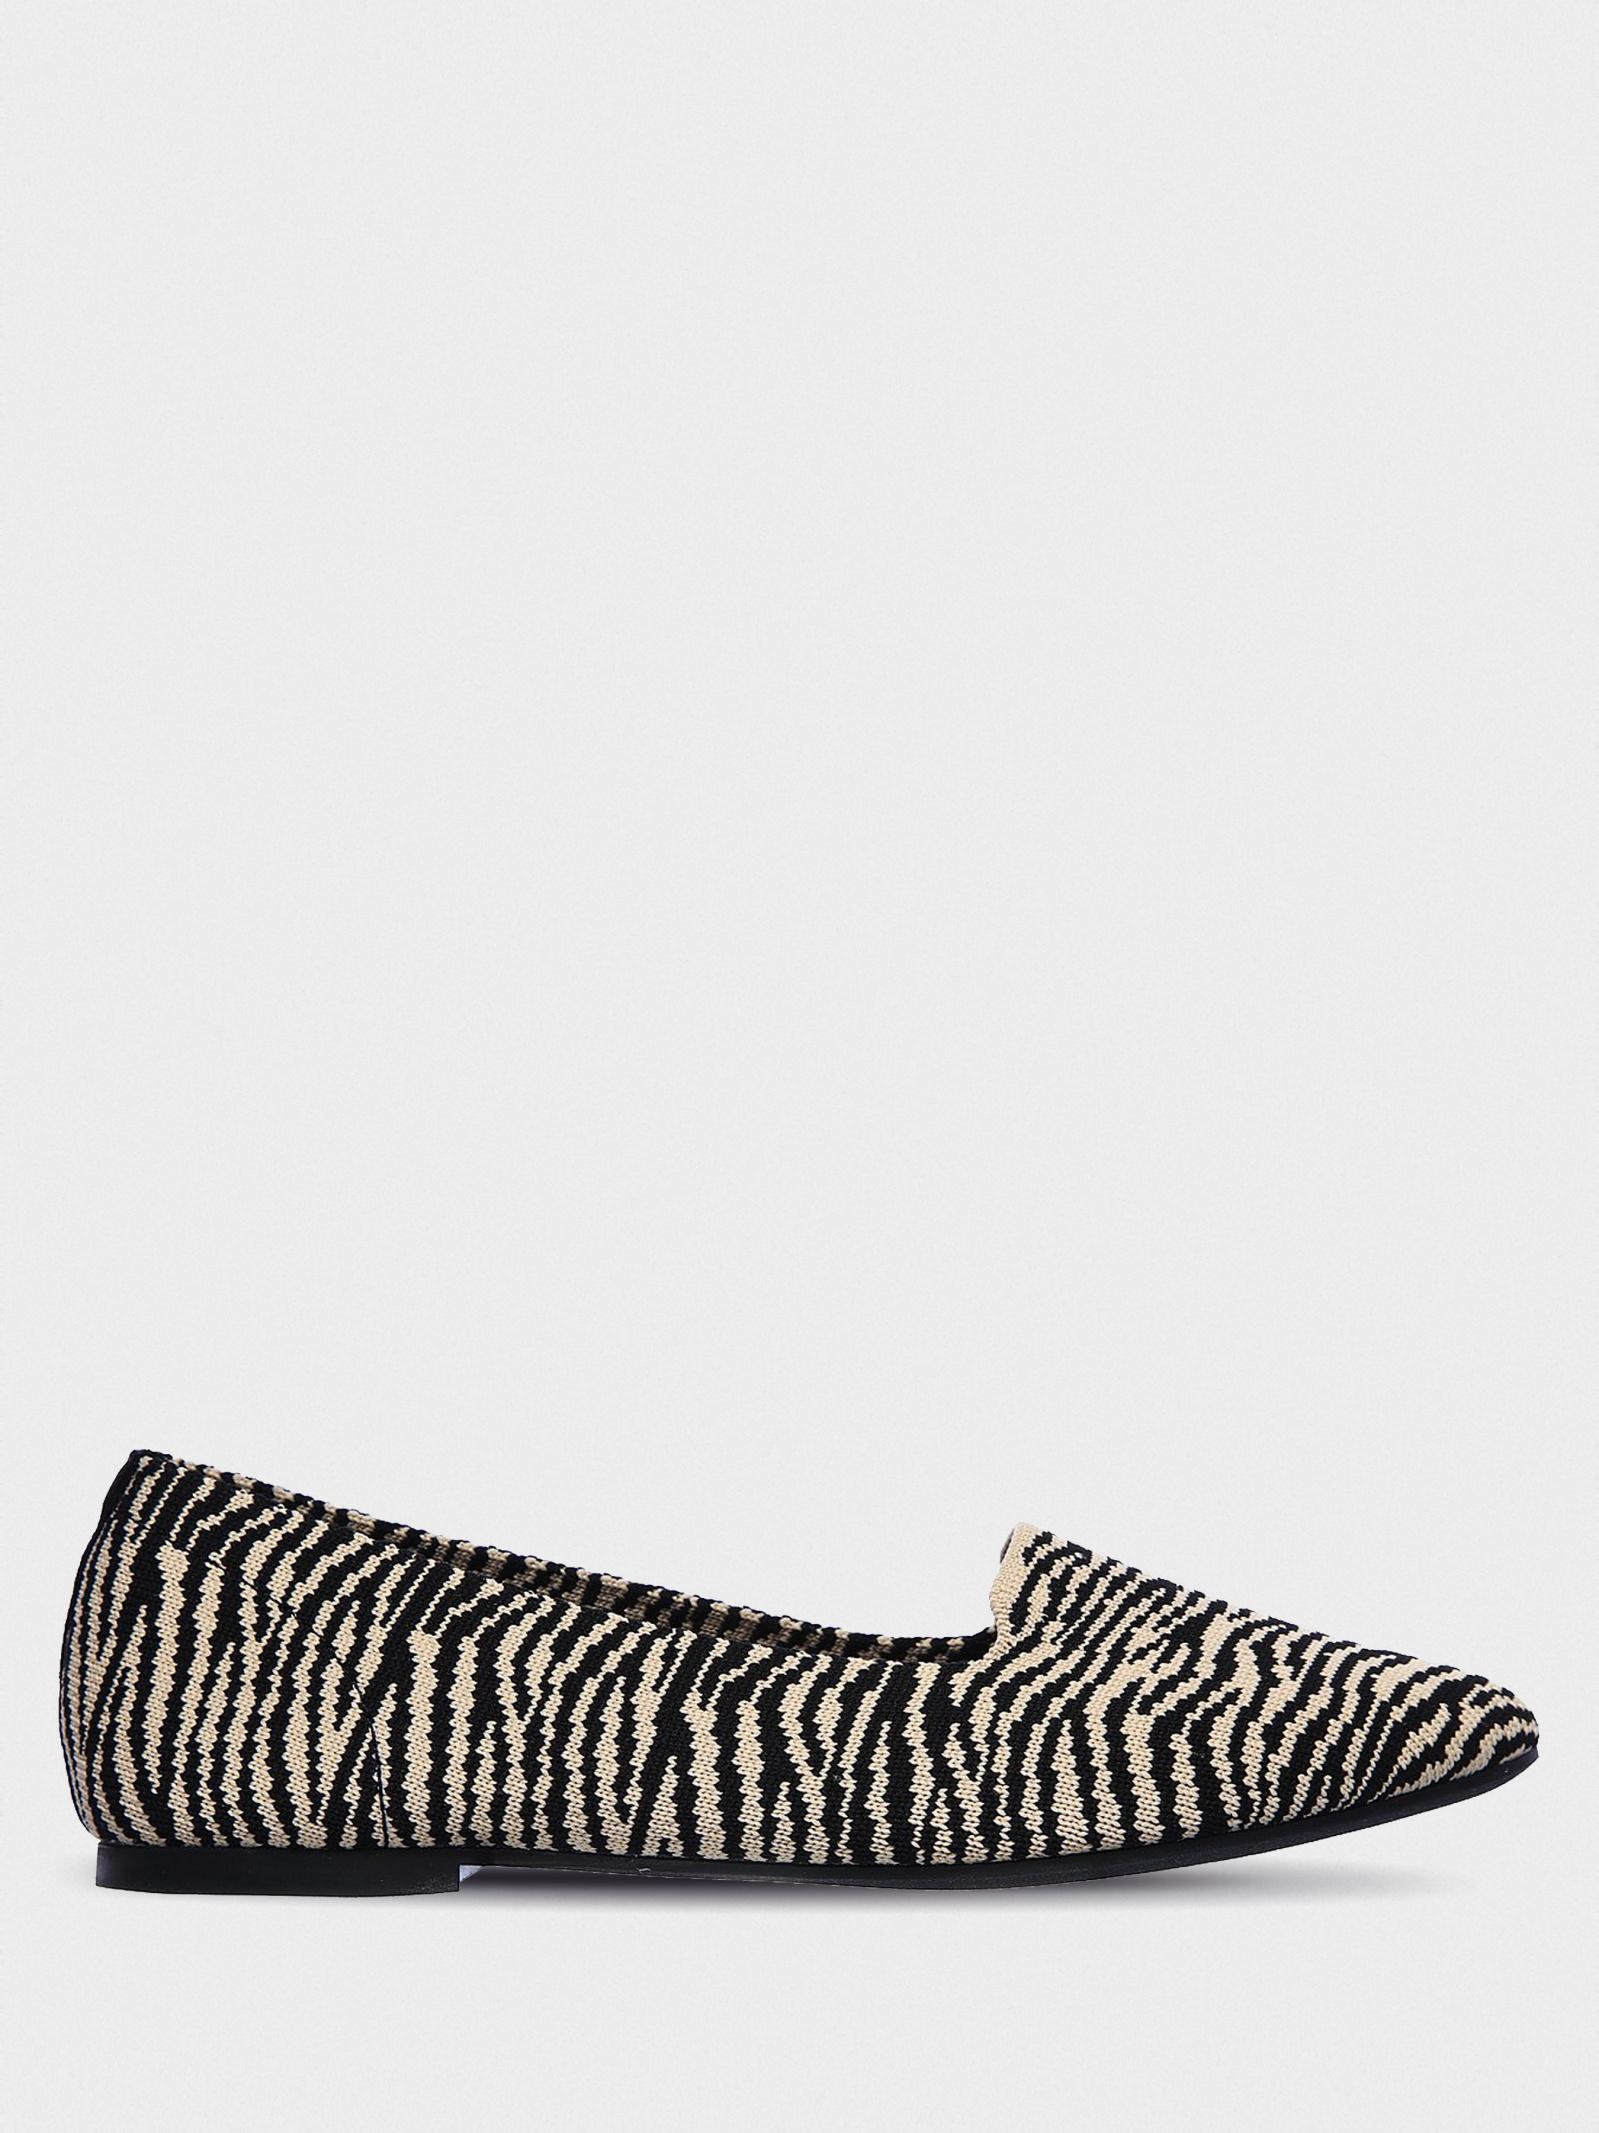 Балетки  для жінок Skechers Modern Comfort 158018 NTBK брендове взуття, 2017